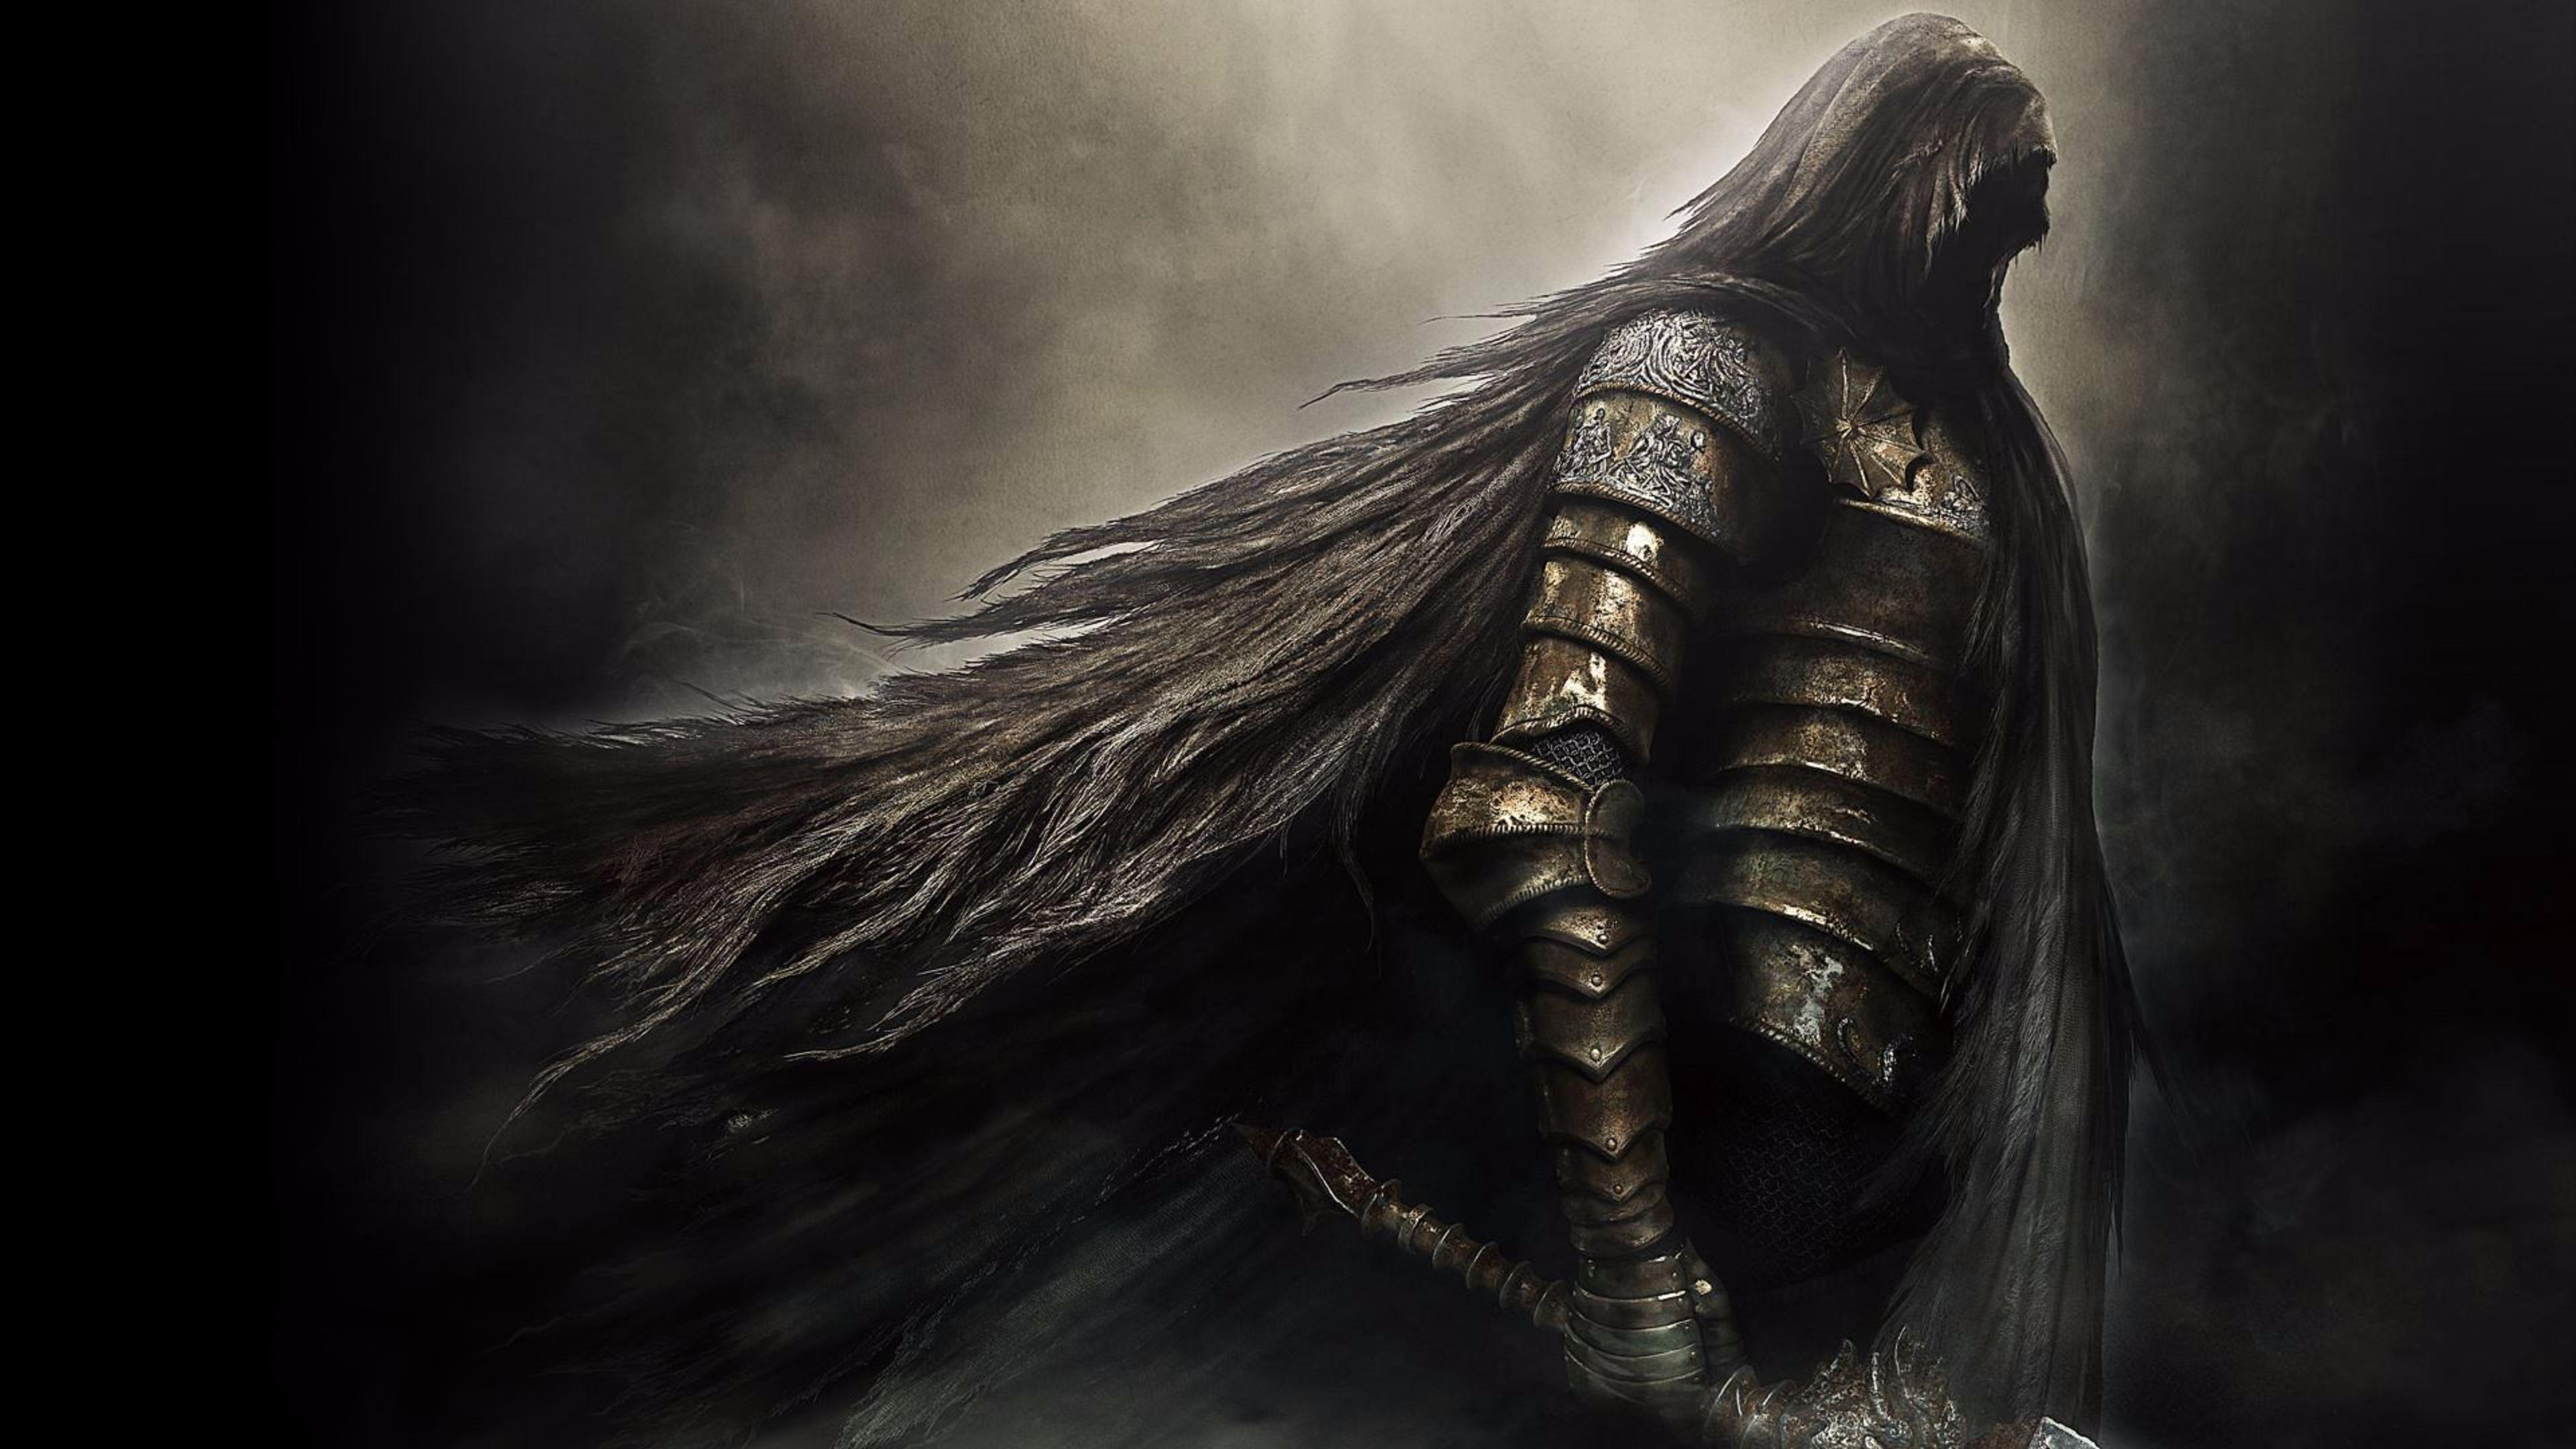 Game of the Year 2016 Dark Souls 3 4K Wallpapers 4K Wallpaper 3840x2160